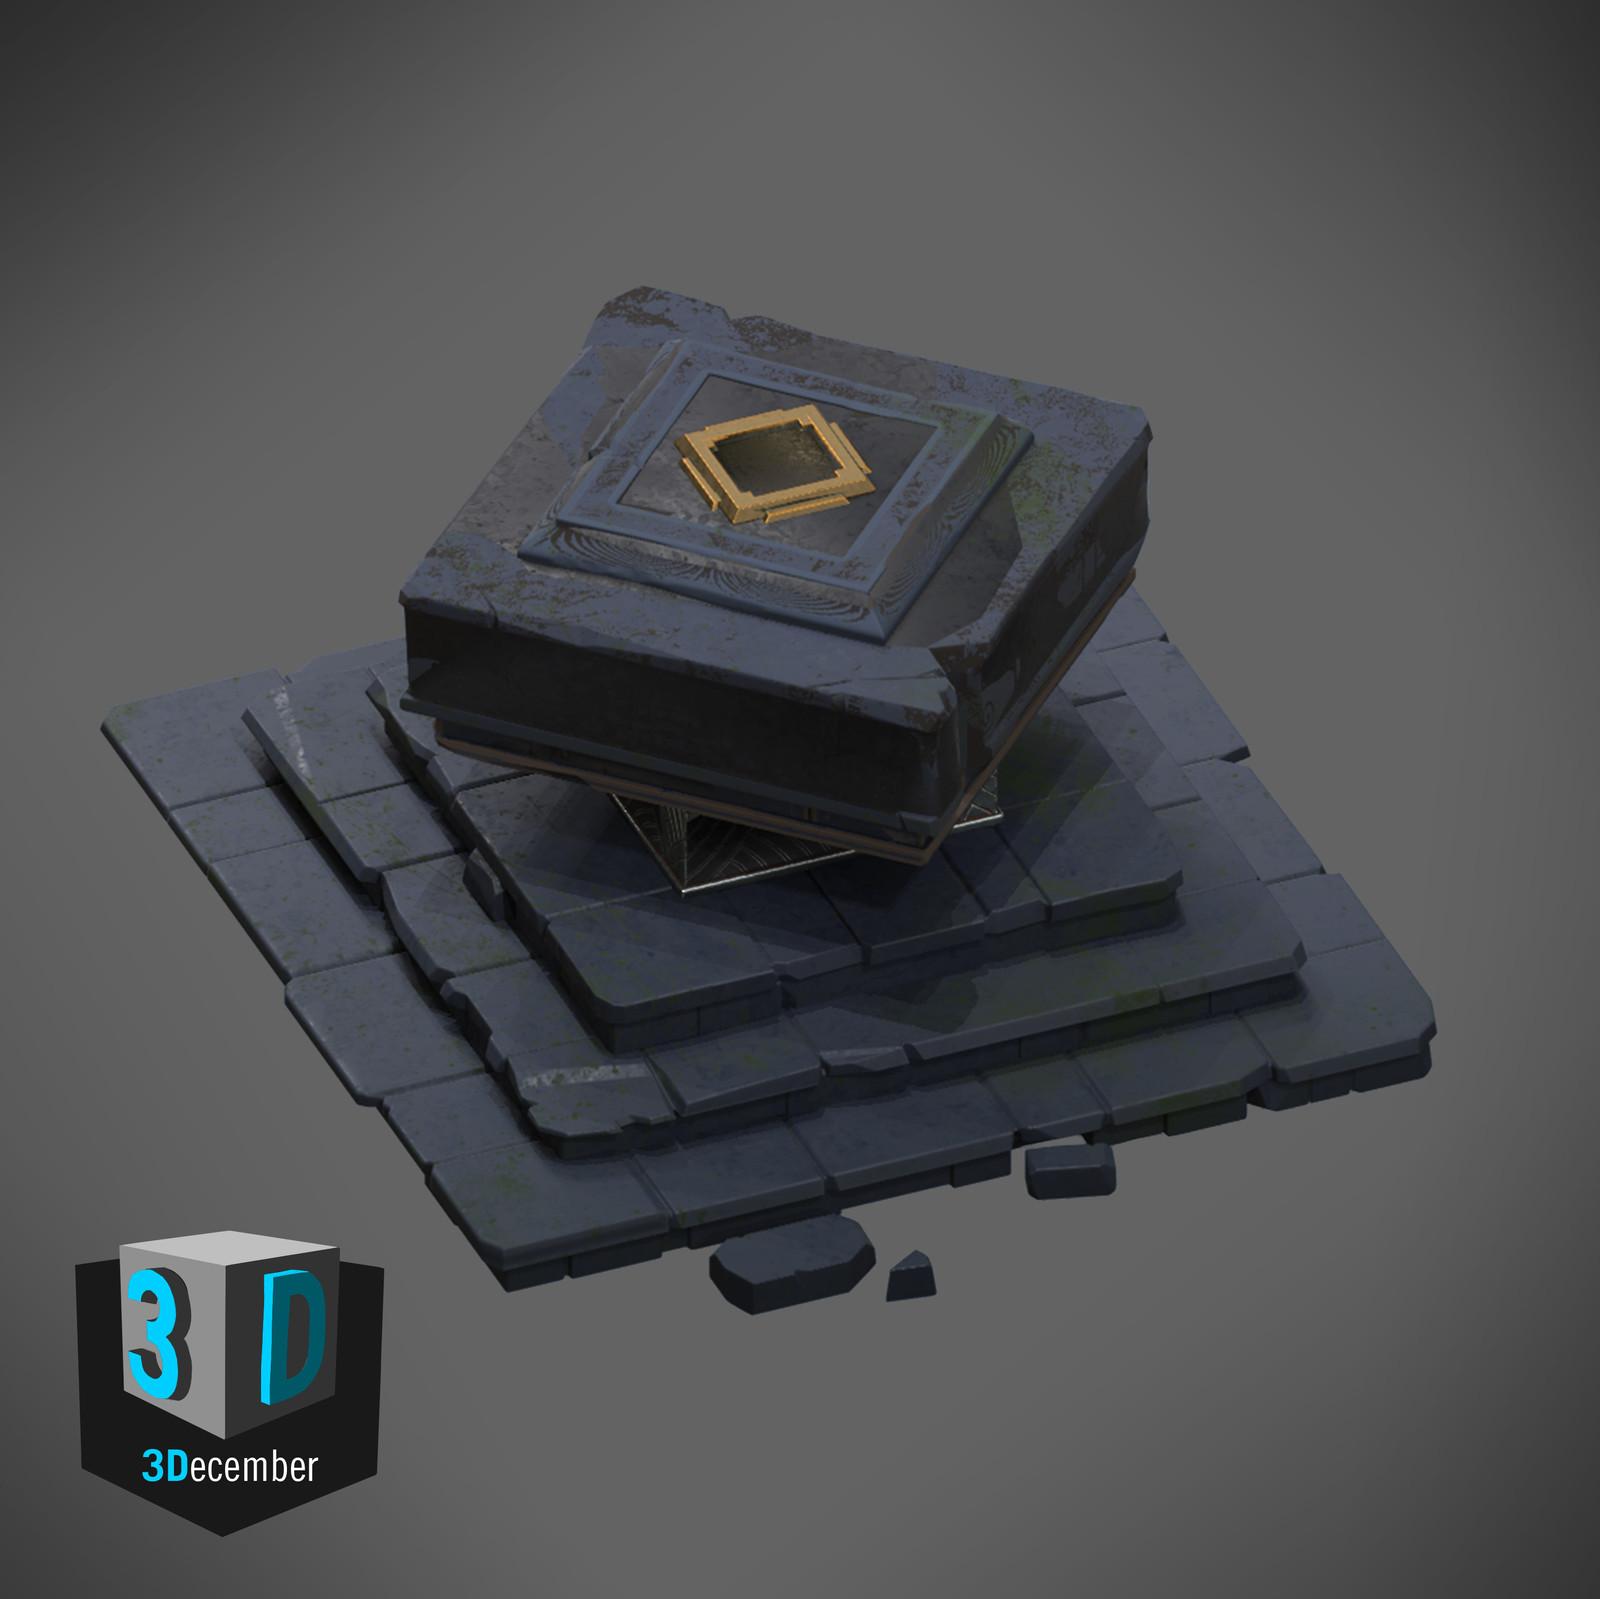 3December - Day 3 - Altar